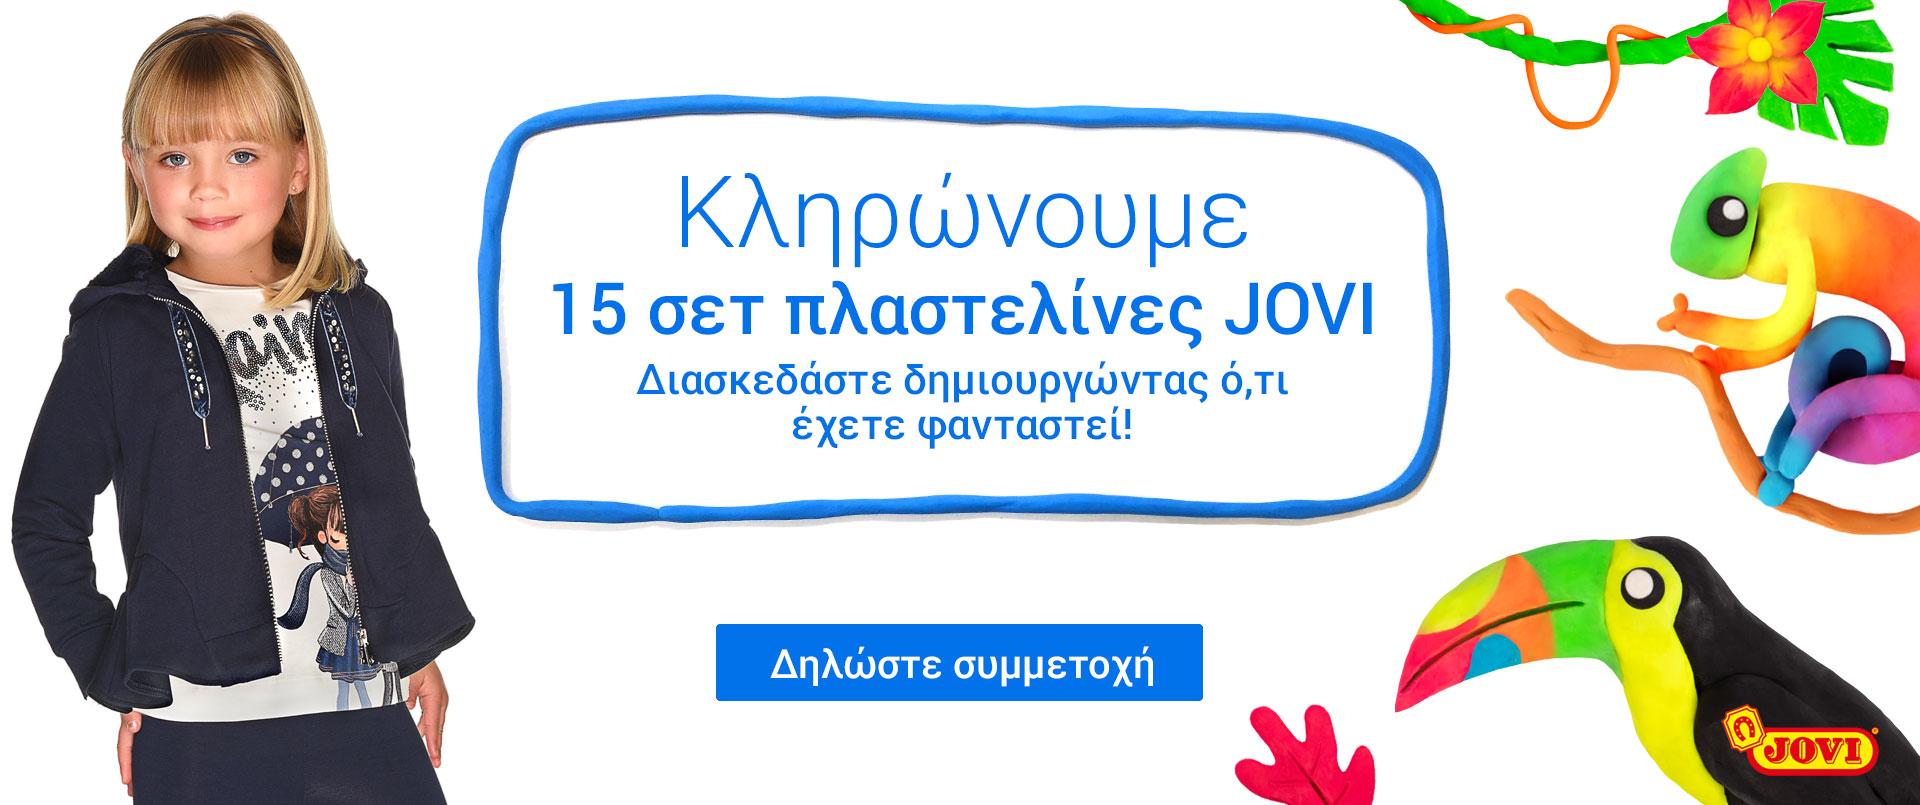 47757e5a5c8 Παιδική μόδα, ρούχα για μωρό, αγόρι και κορίτσι | Mayoral